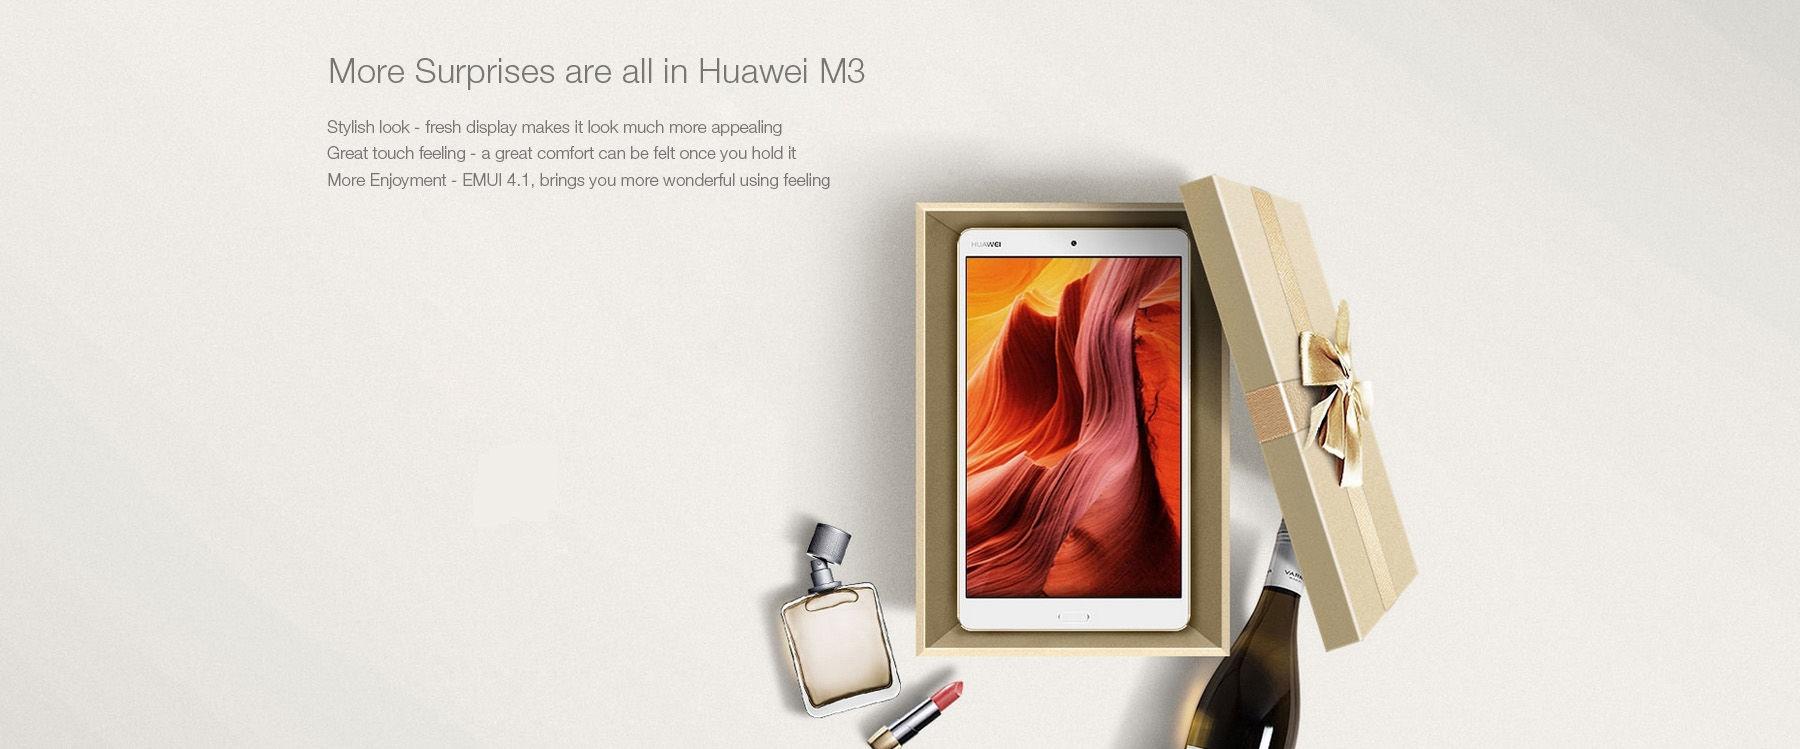 Huawei M3 ( BTV-DL09 ) 8.4 inch 4G Phablet 2K IPS Screen Android 6.0 Kirin 950 Octa Core 2.3GHz 4GB RAM 64GB ROM Dual WiFi OTG Fingerprint Sensor